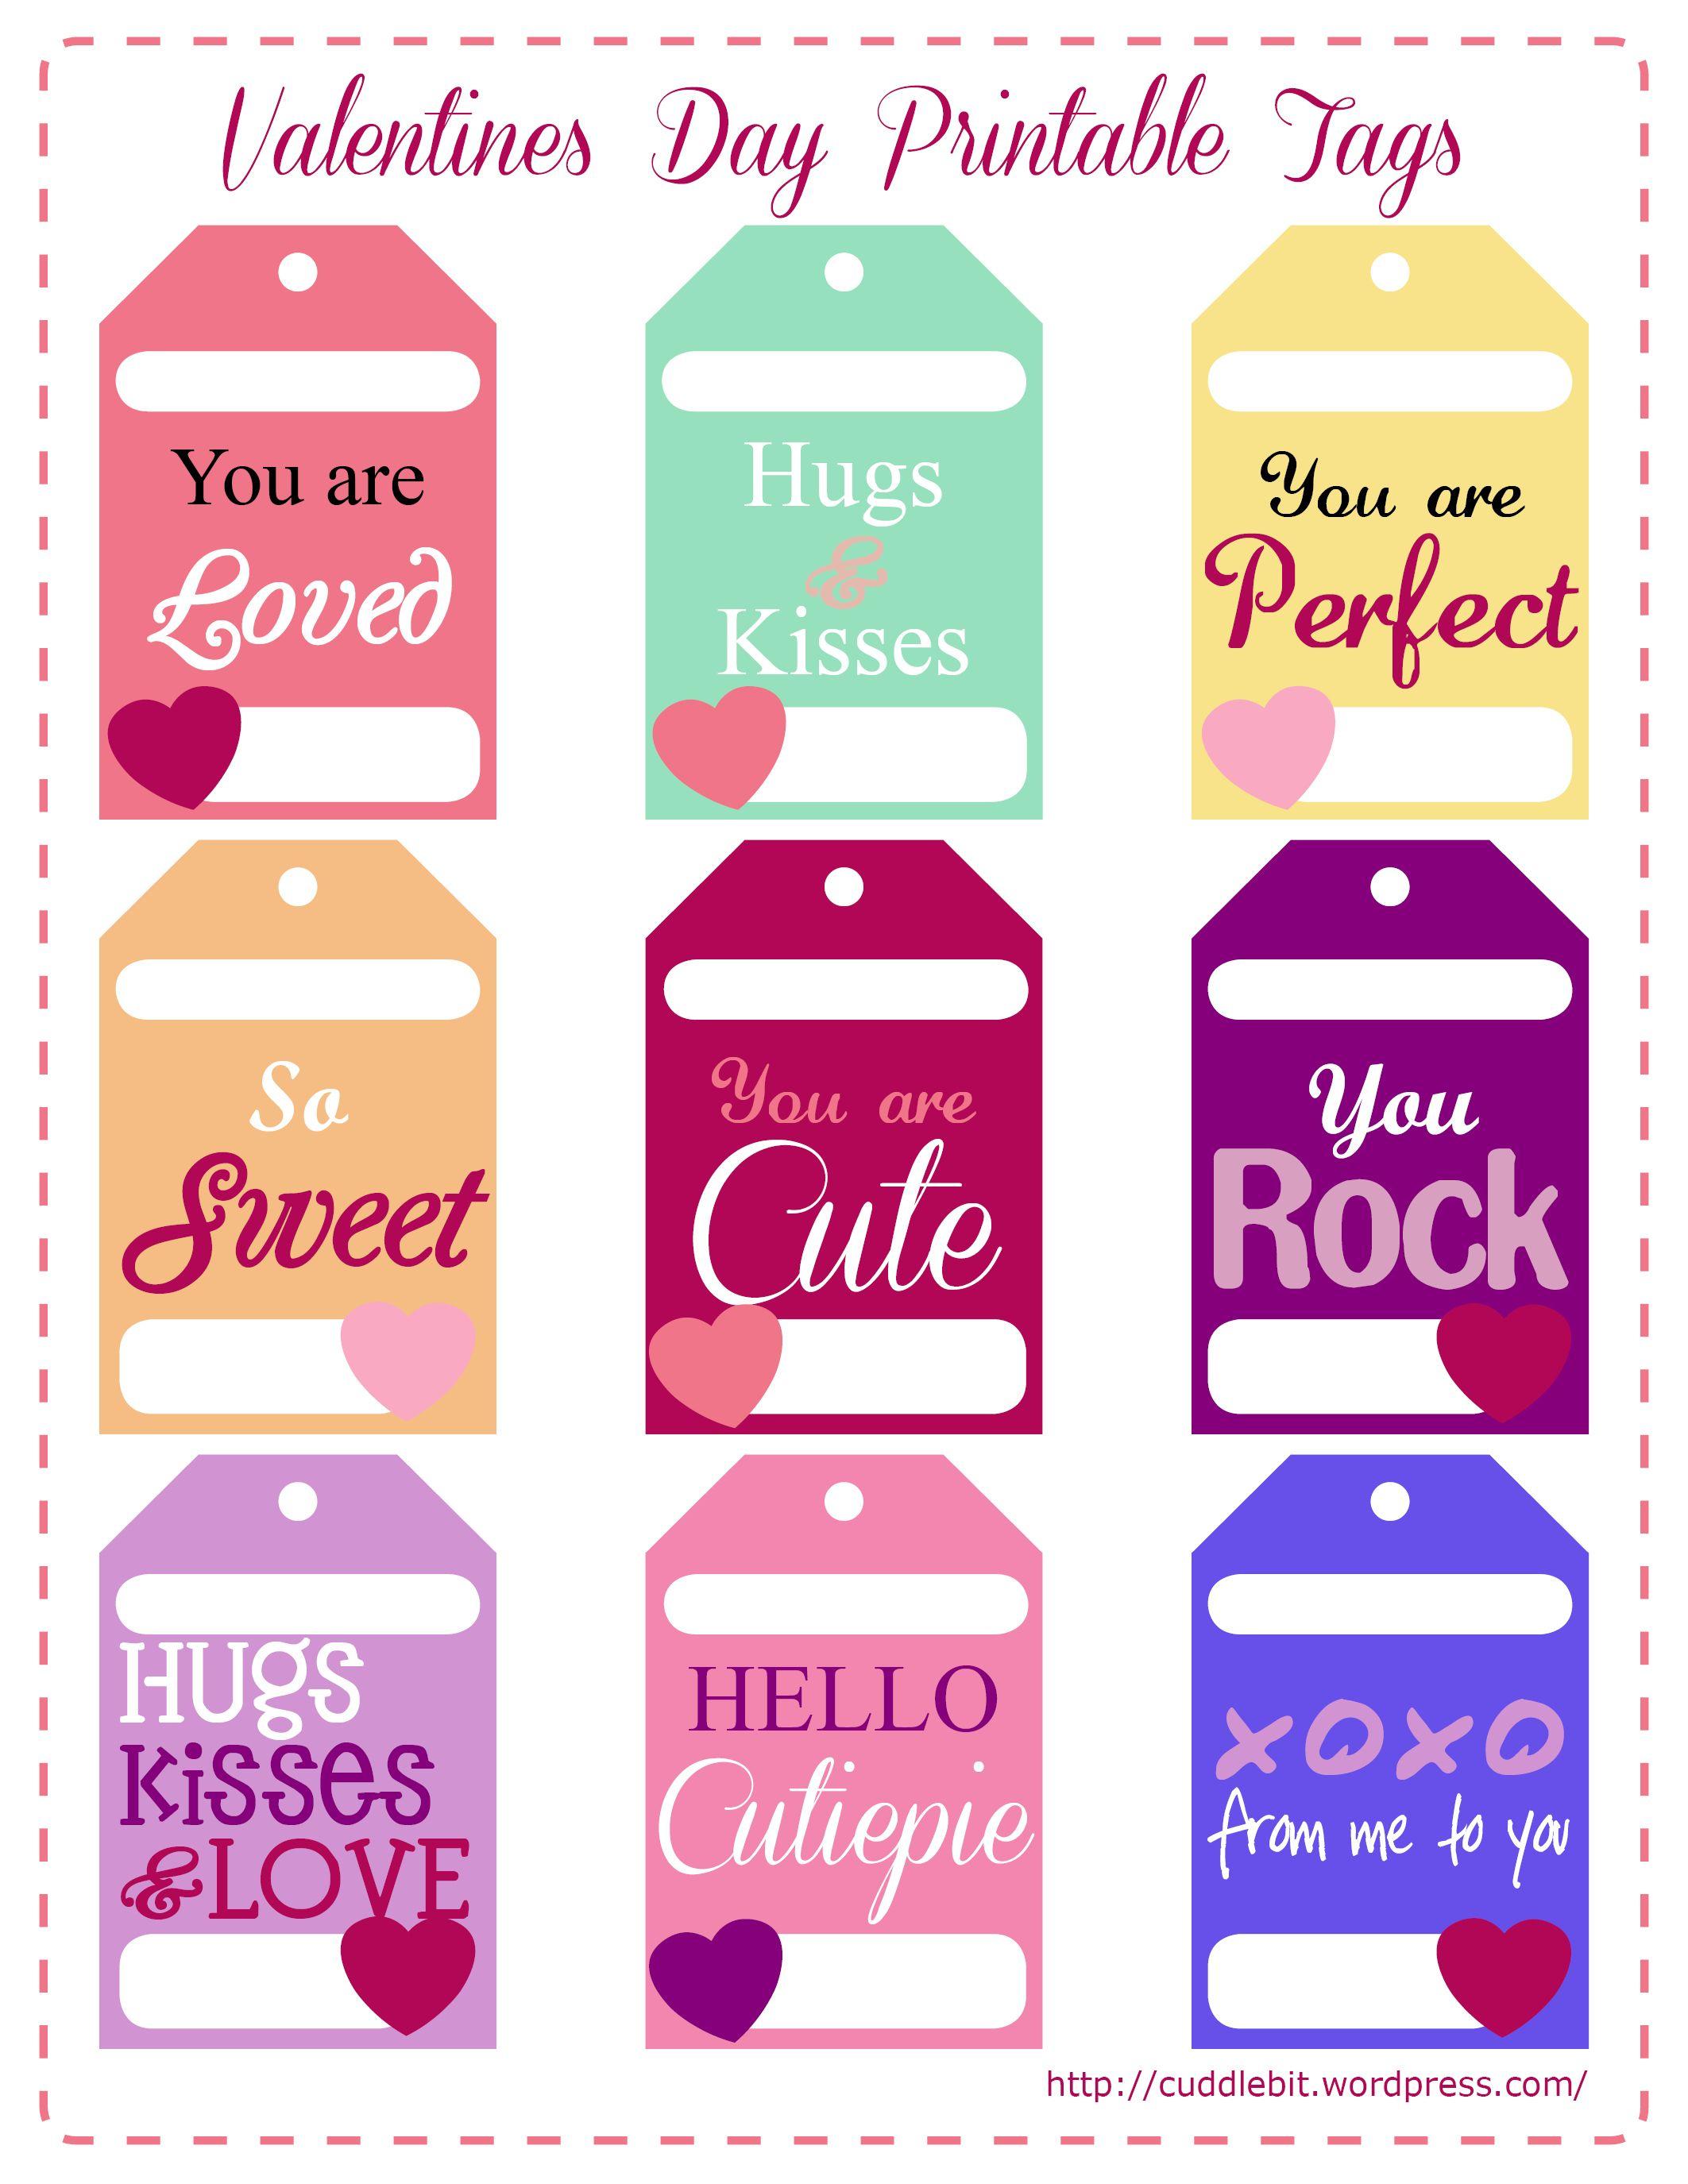 Valentine's Day Love Packs   So Stinking Cute!!   Valentines - Free Printable Valentine Tags